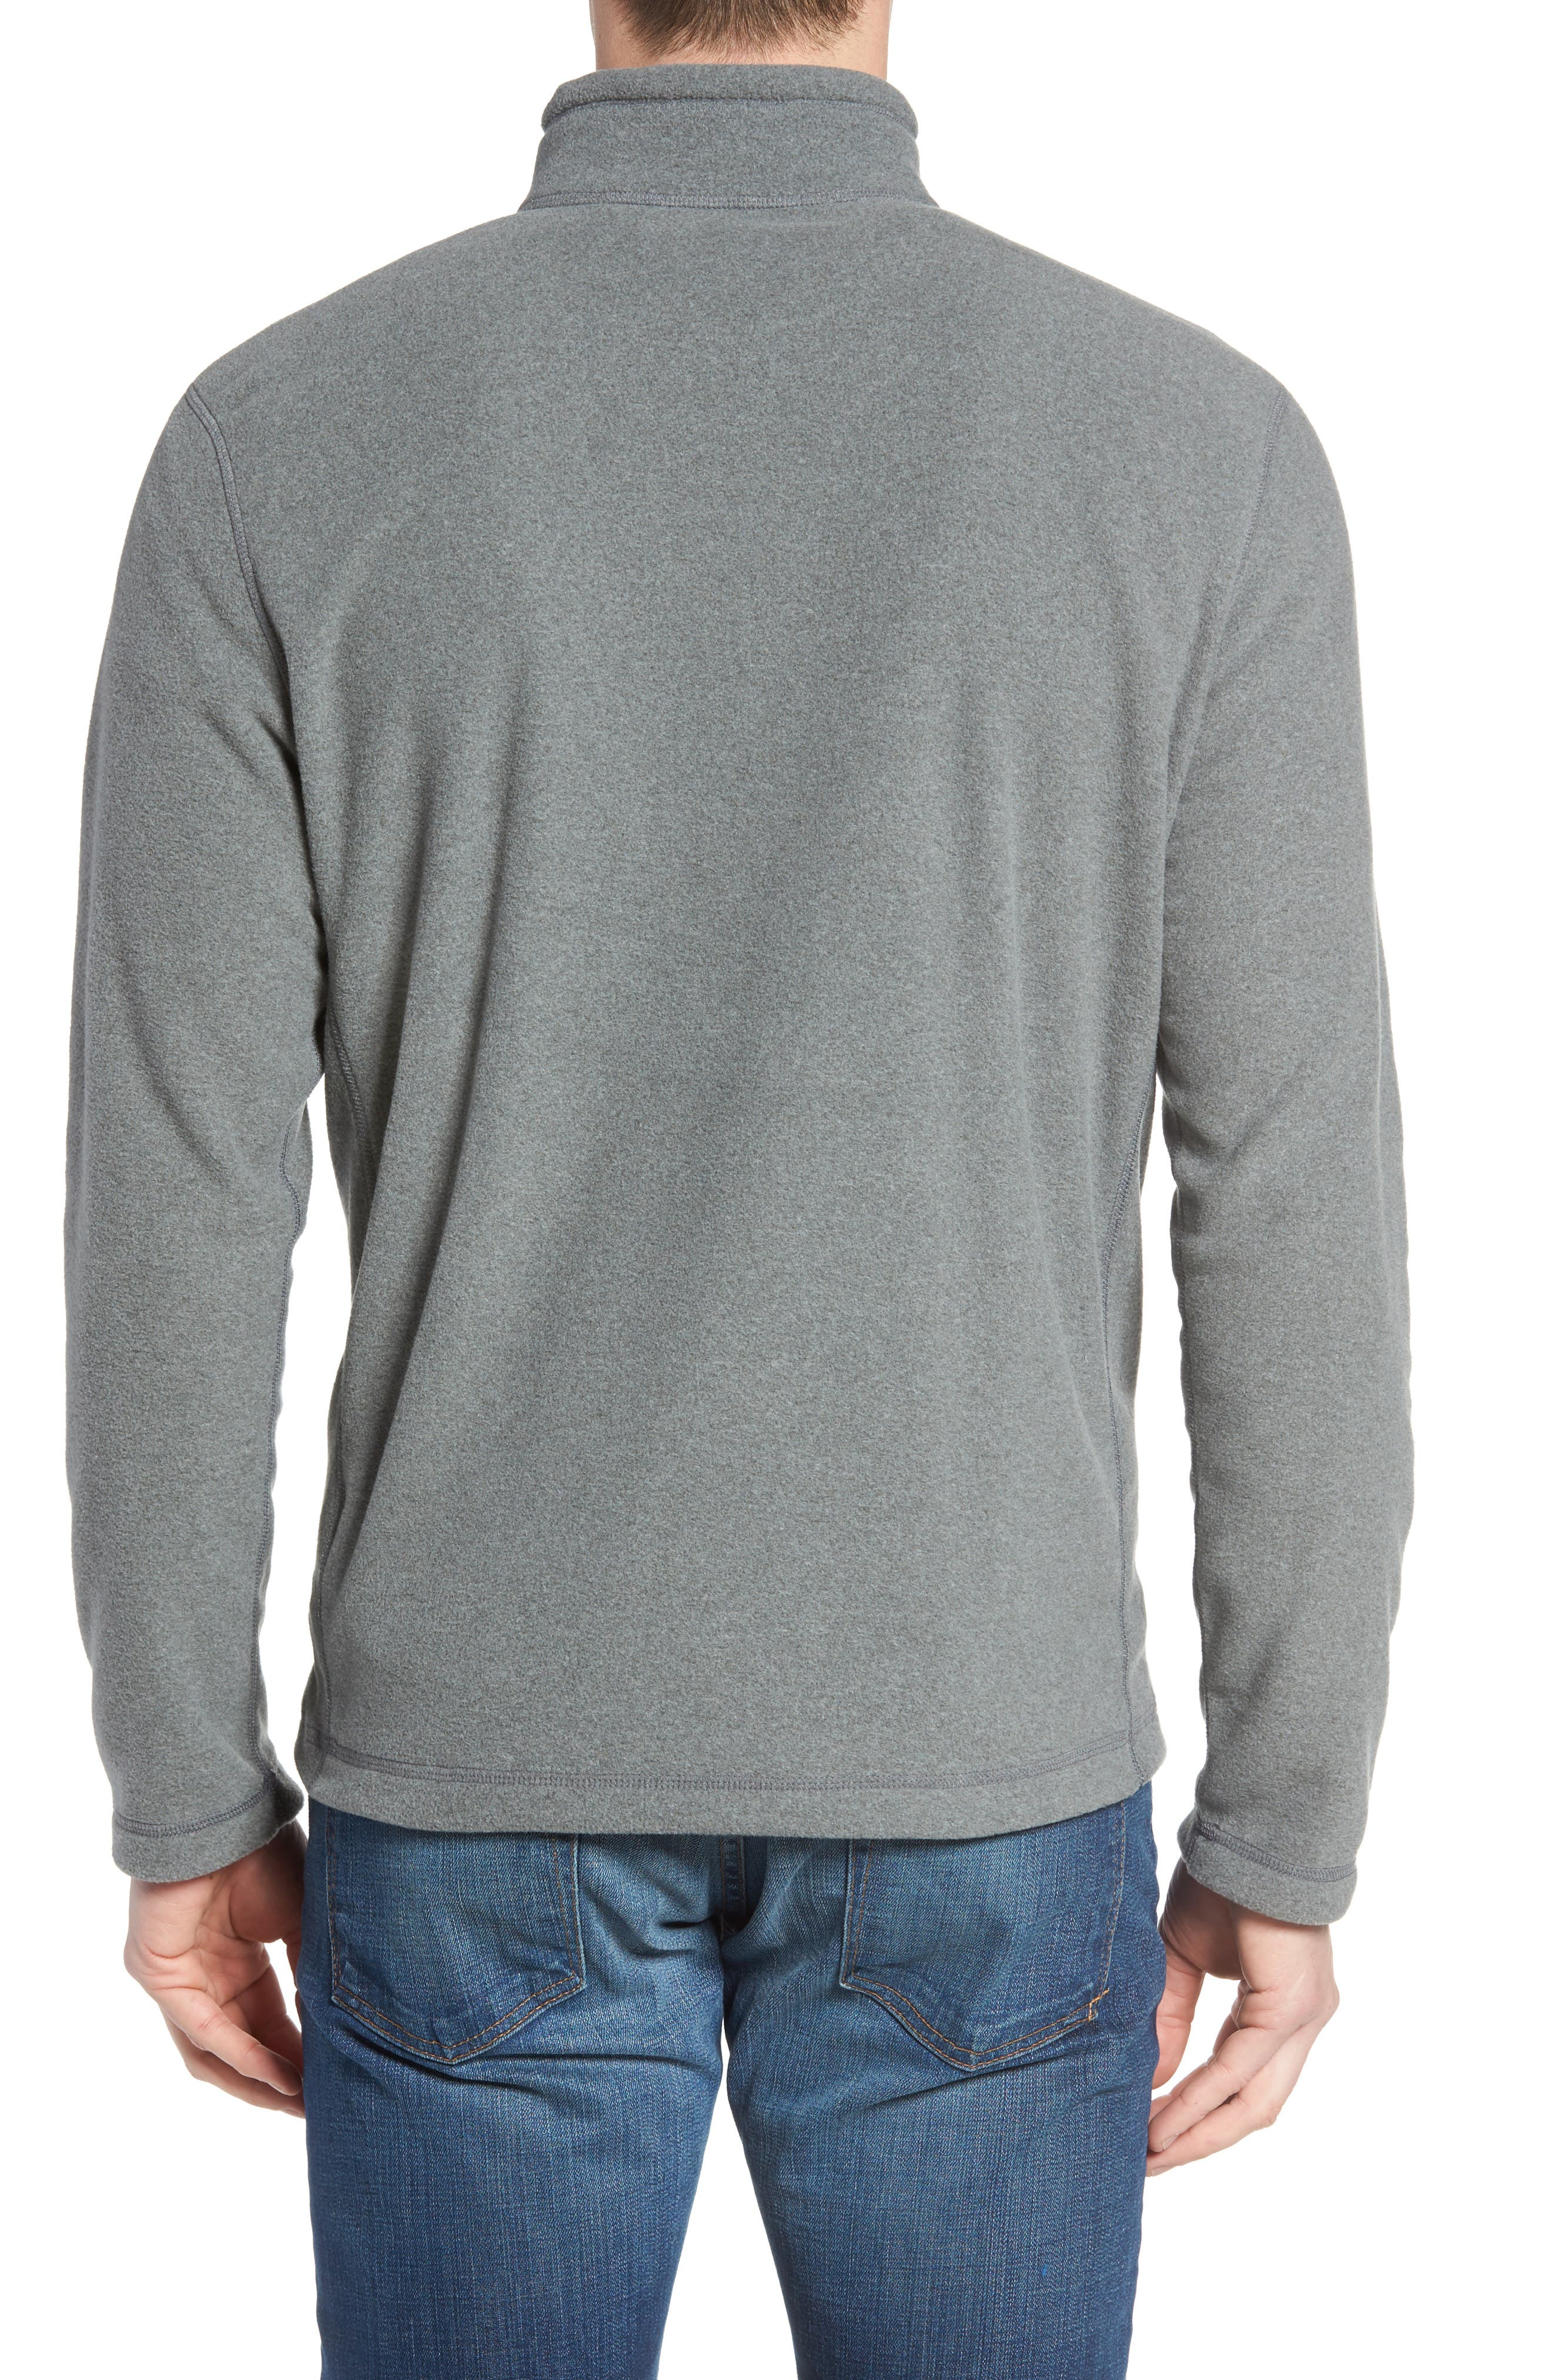 'TKA 100 Glacier' Quarter Zip Fleece Pullover,                             Alternate thumbnail 68, color,